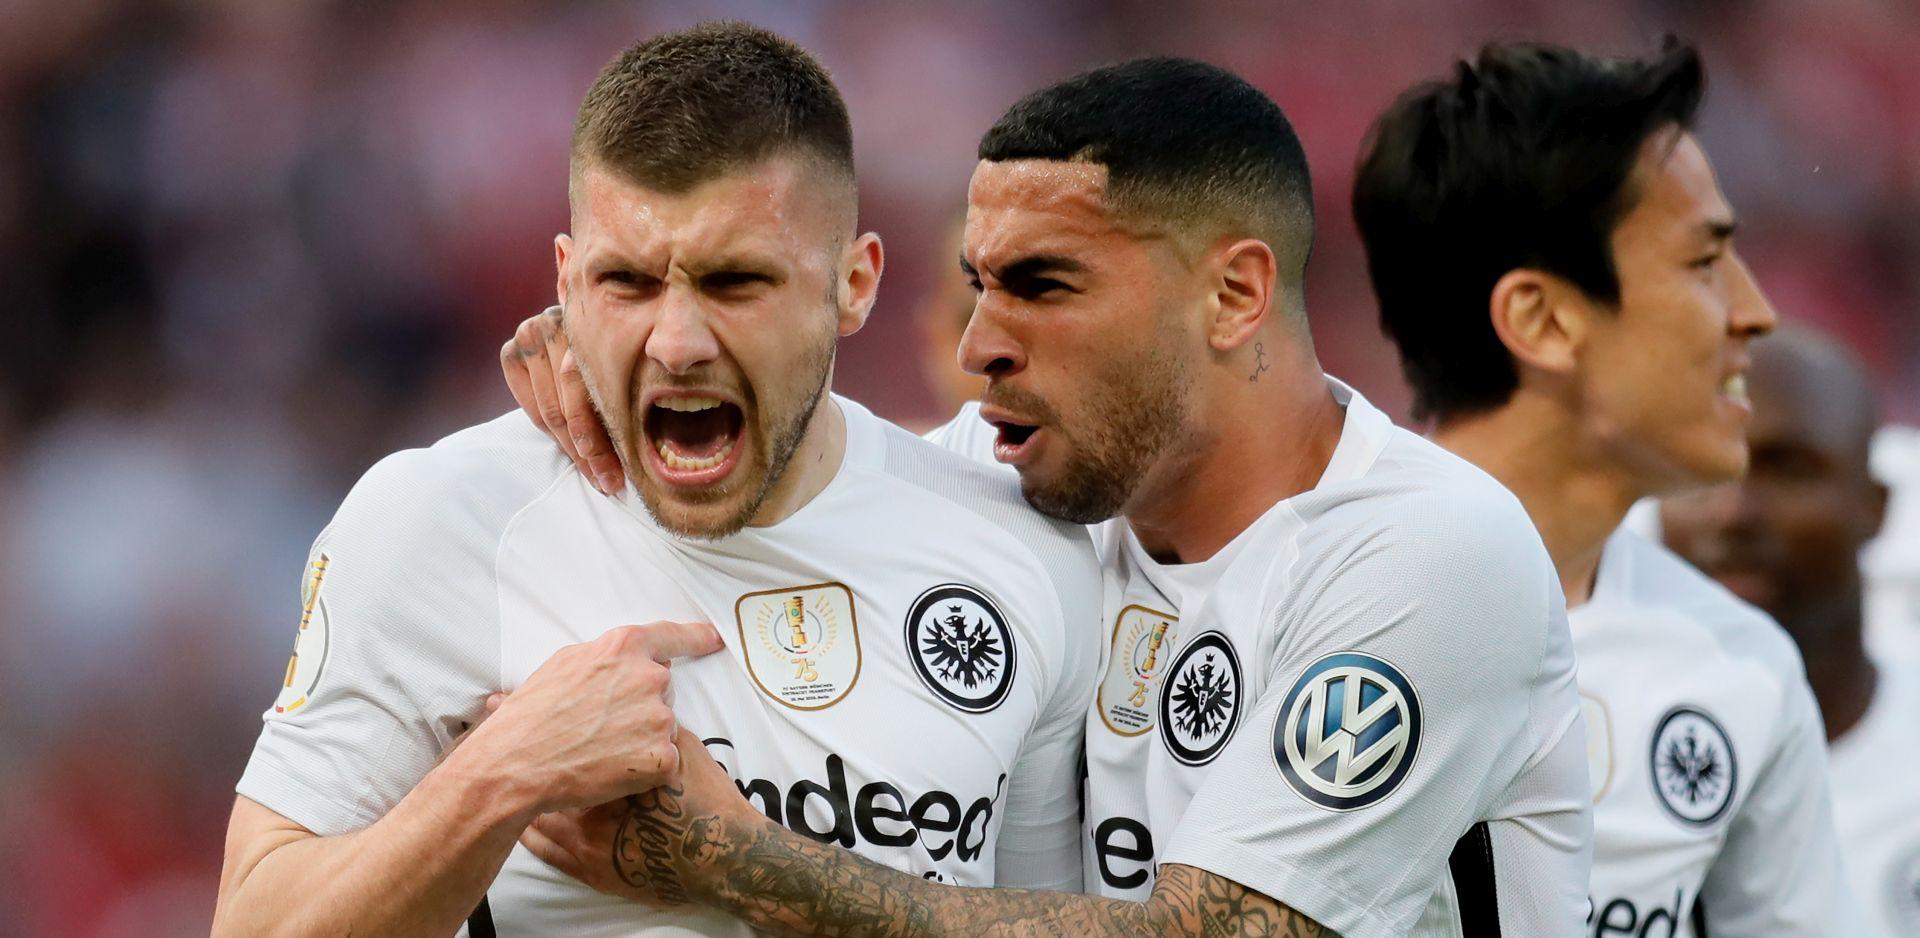 TROFEJ ZA KRAJ Kovačev Eintracht osvojio Kup, Rebić dvostruki strijelac